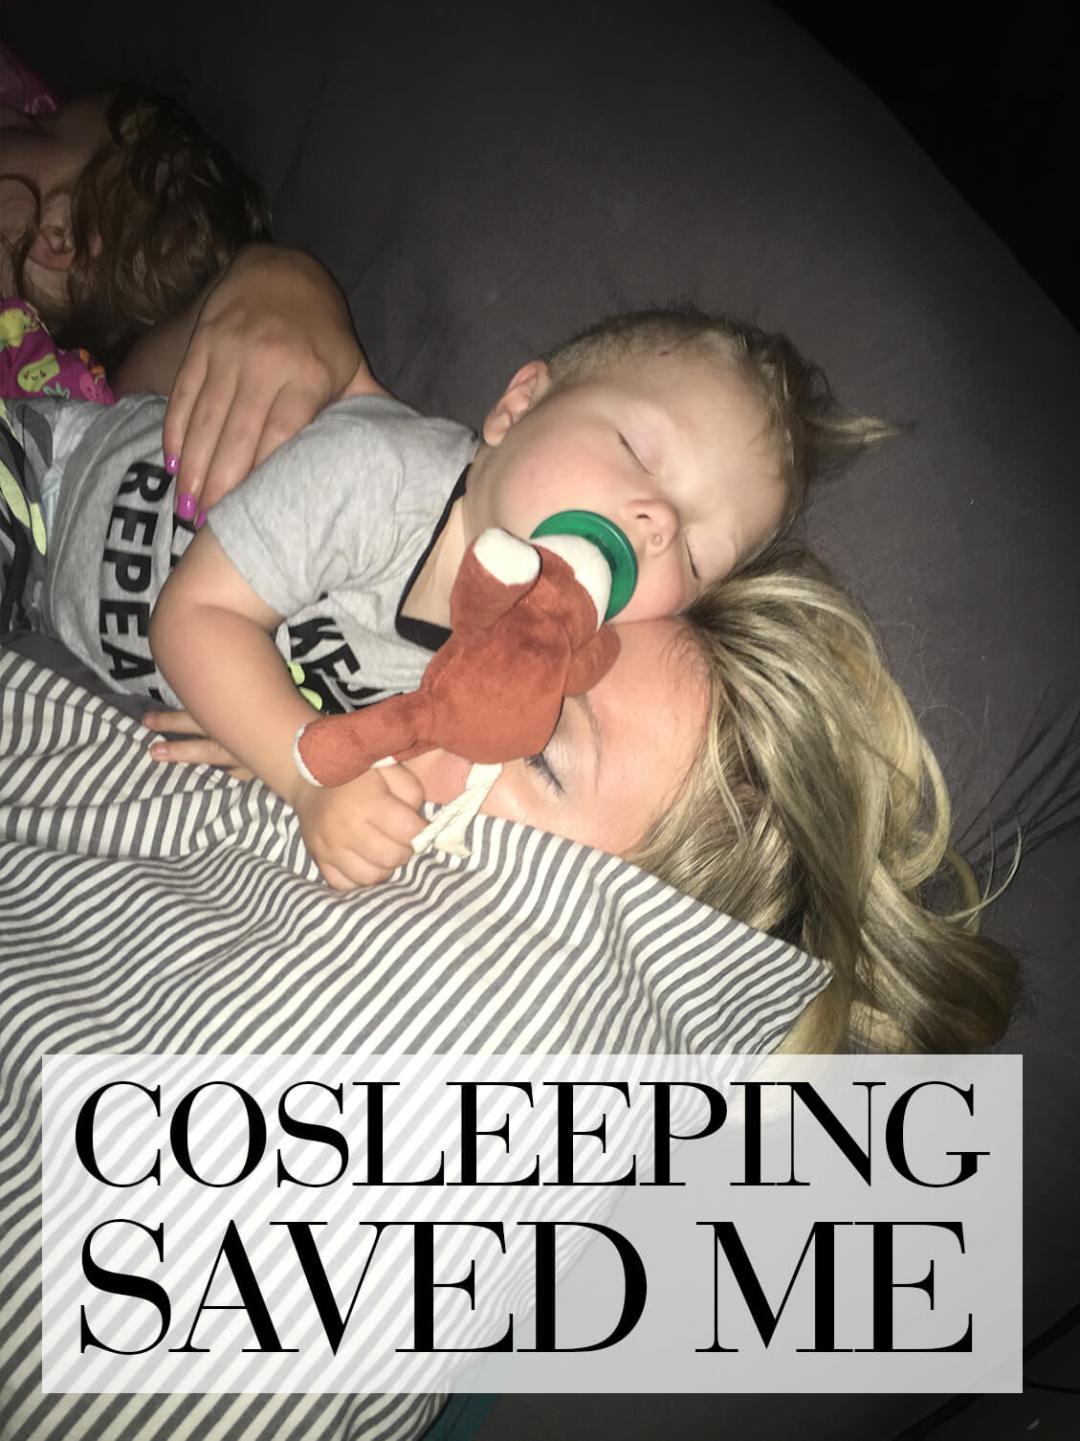 Cosleeping Saved Me